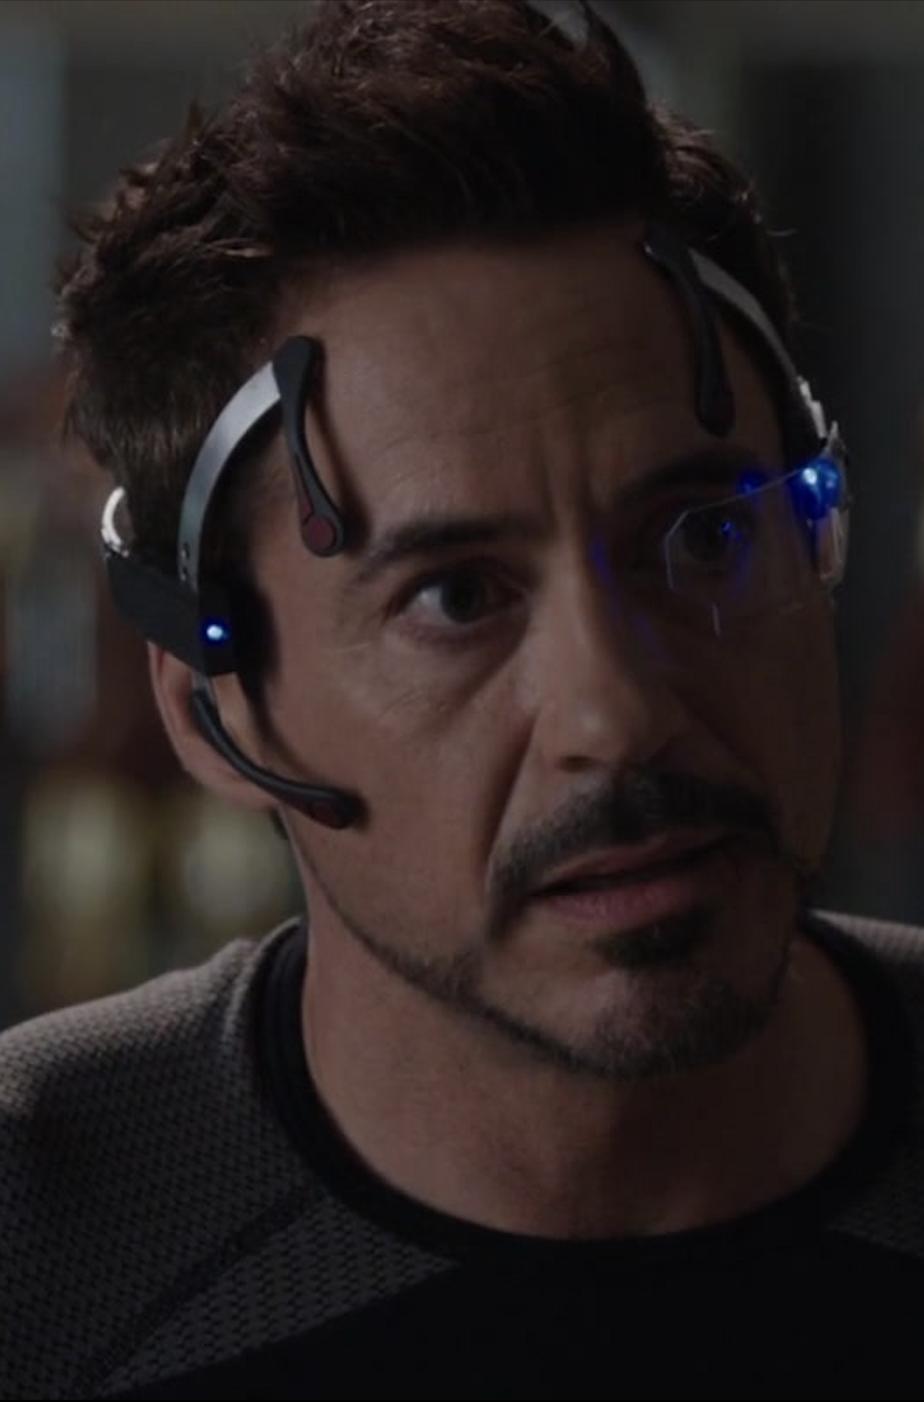 File:Iron Man Mark XLII Telepresence Headset.png